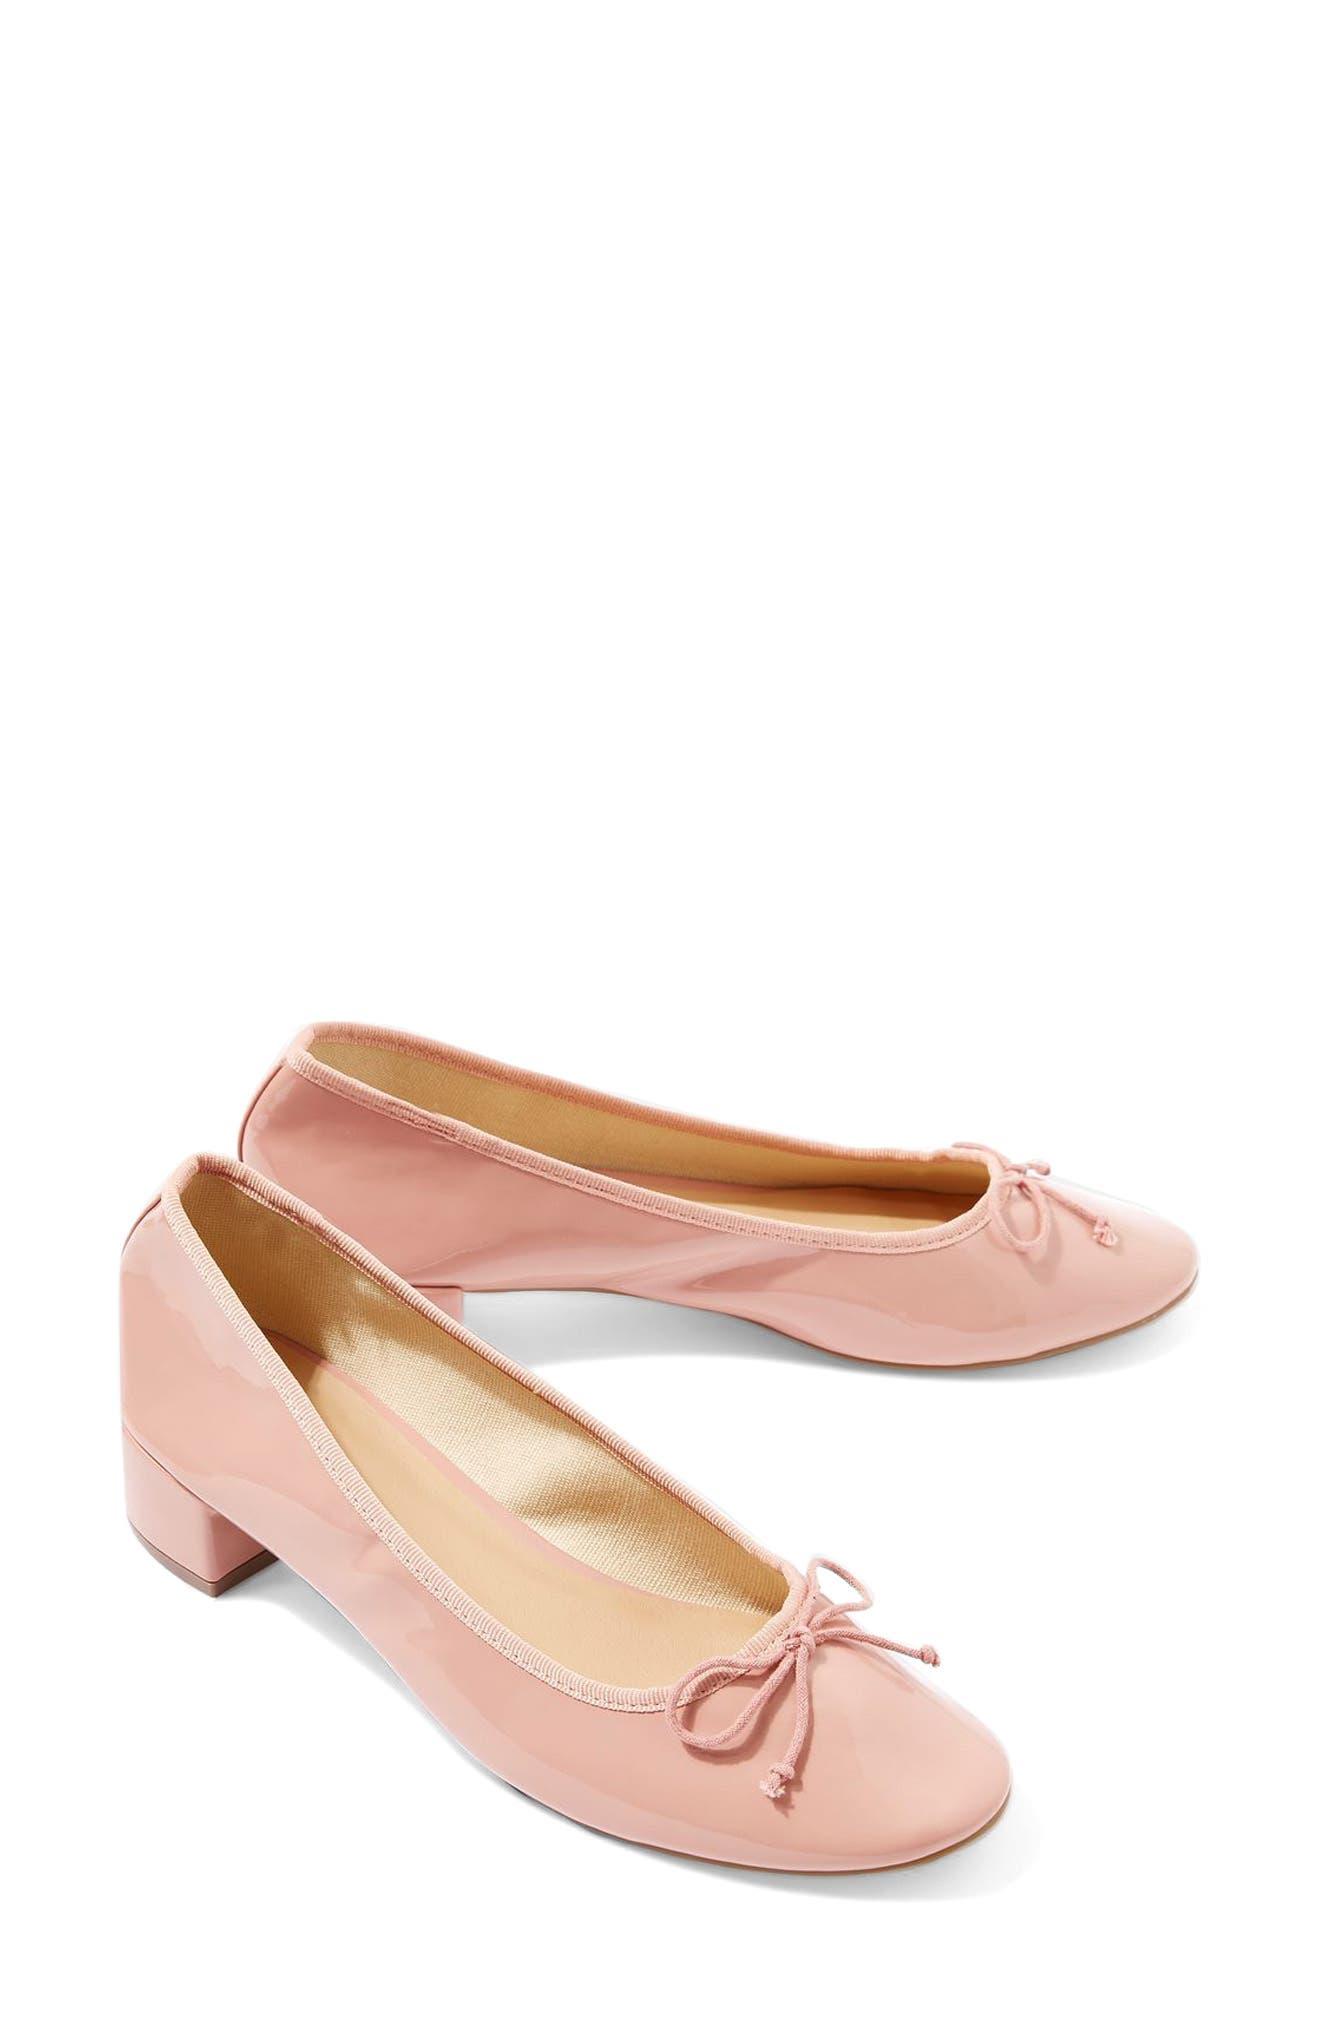 Alternate Image 1 Selected - Topshop Glory Heeled Ballerina Slippers